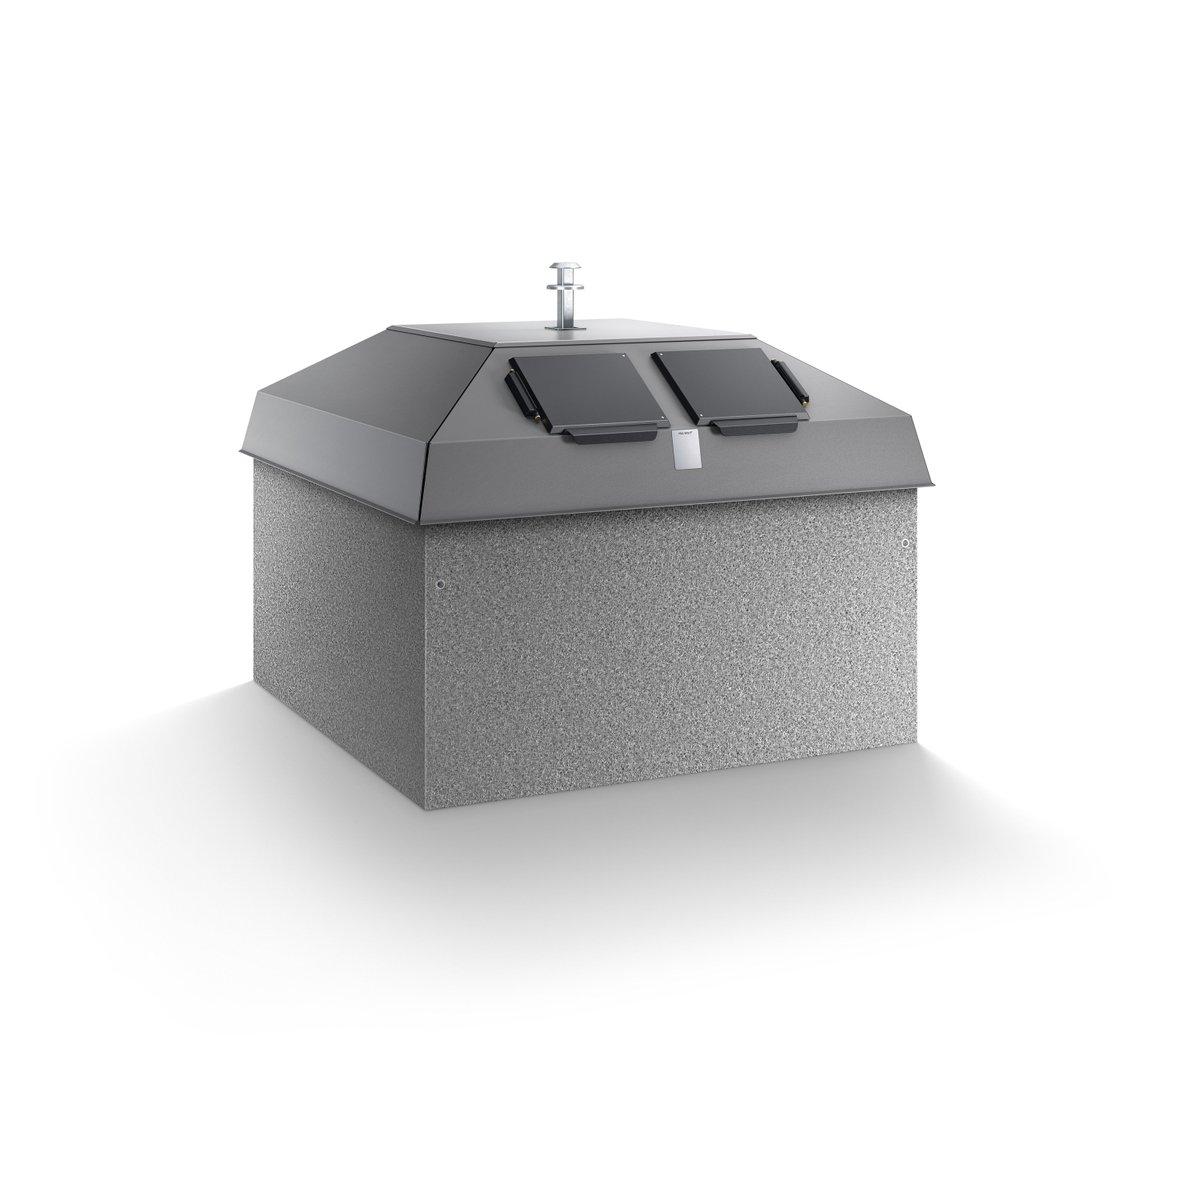 paul wolff paul wolff twitter. Black Bedroom Furniture Sets. Home Design Ideas